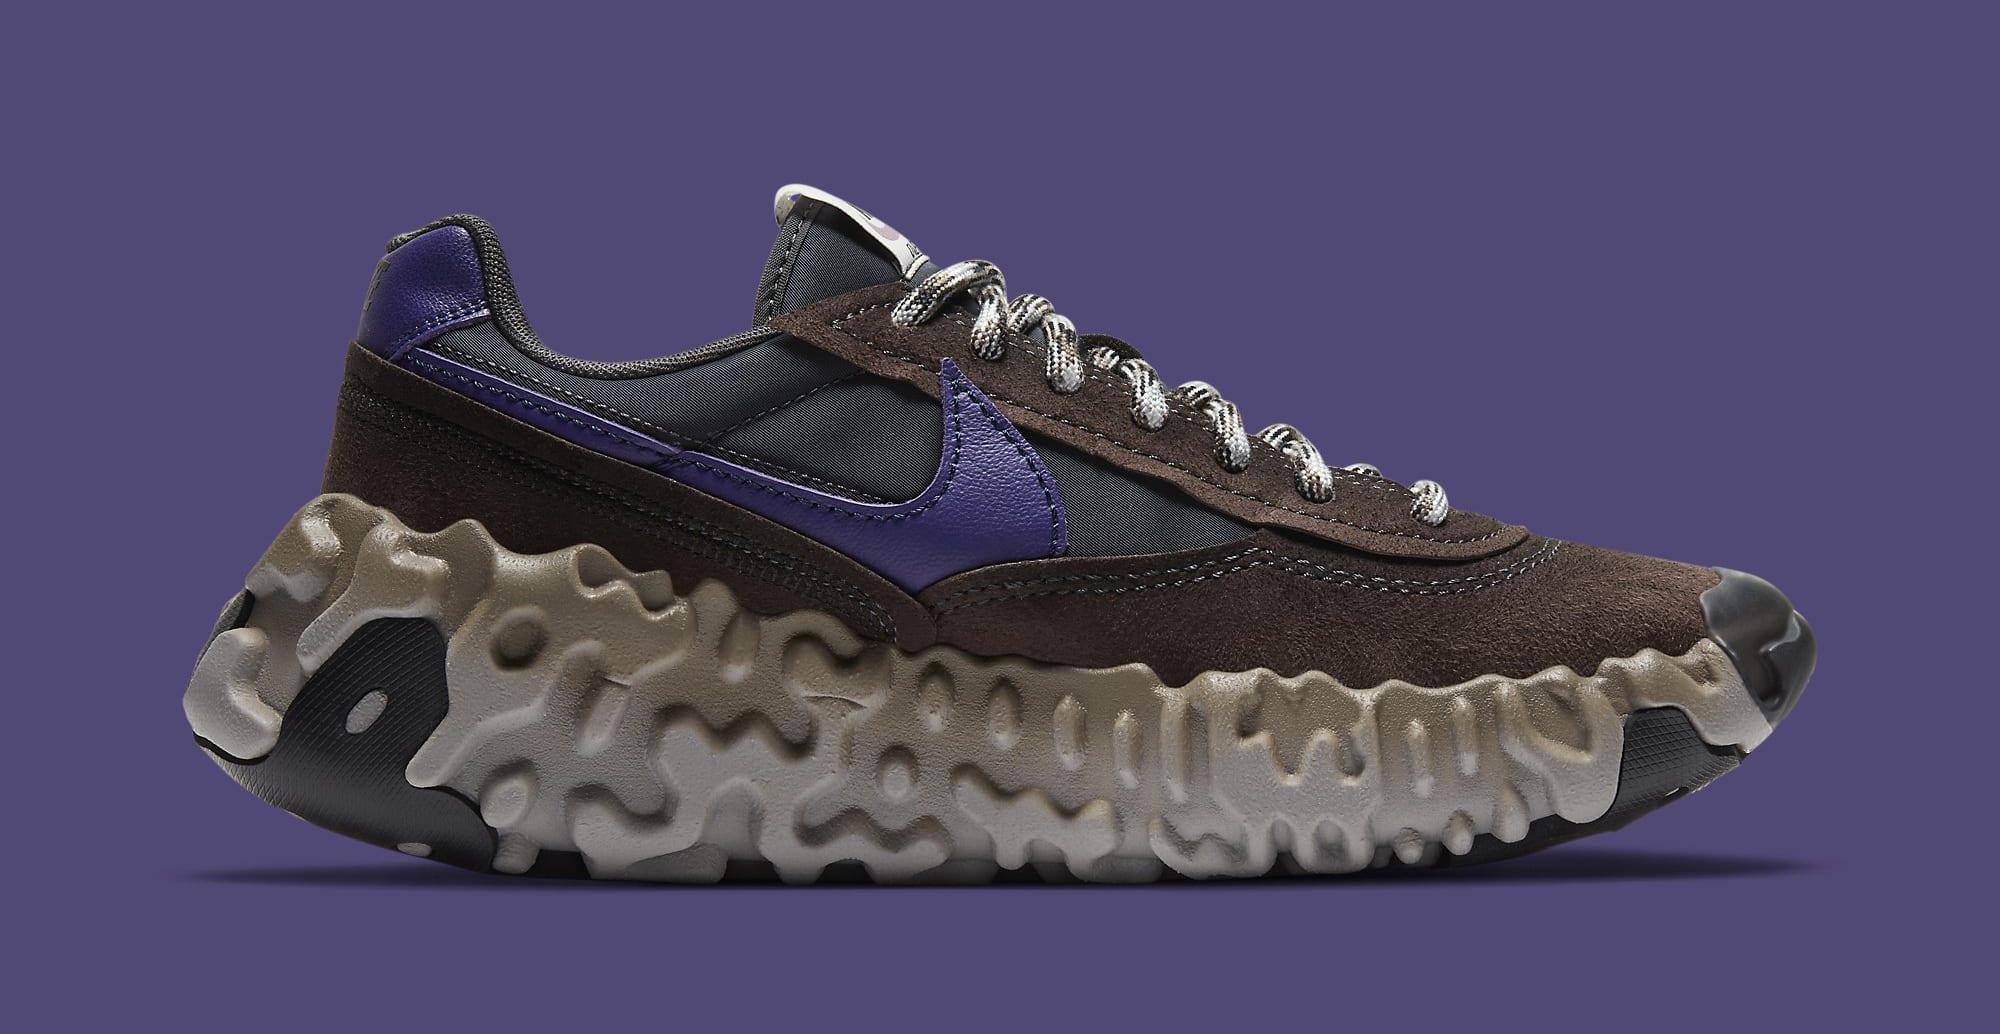 Nike Overbreak 'Baroque Brown' DA9784-200 Medial